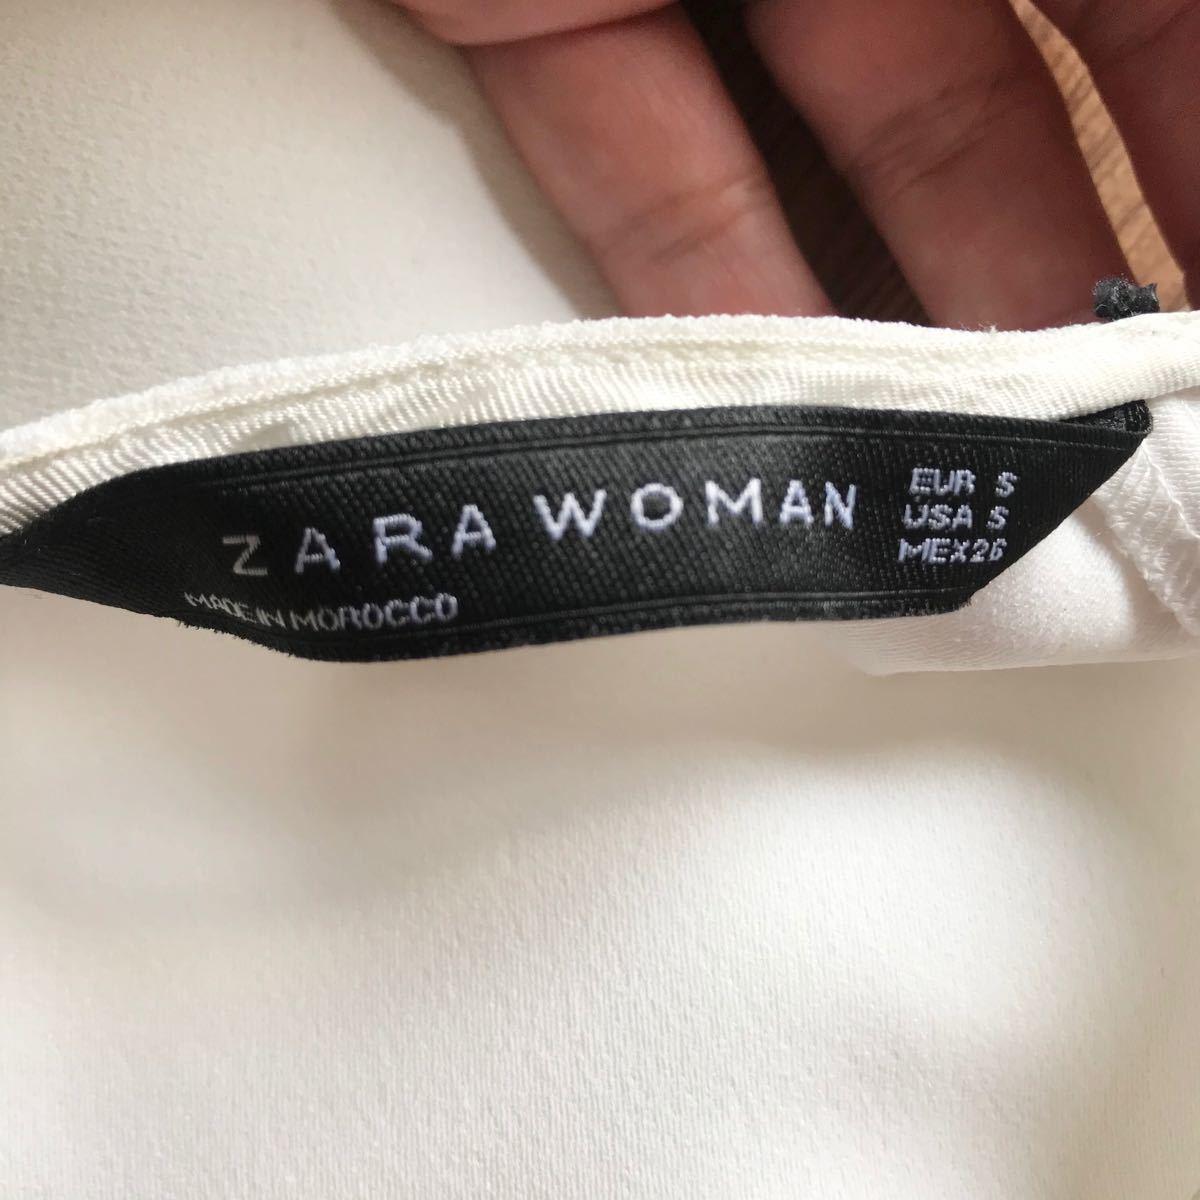 ZARA ブラウス トップス カットソー 半袖 ホワイト